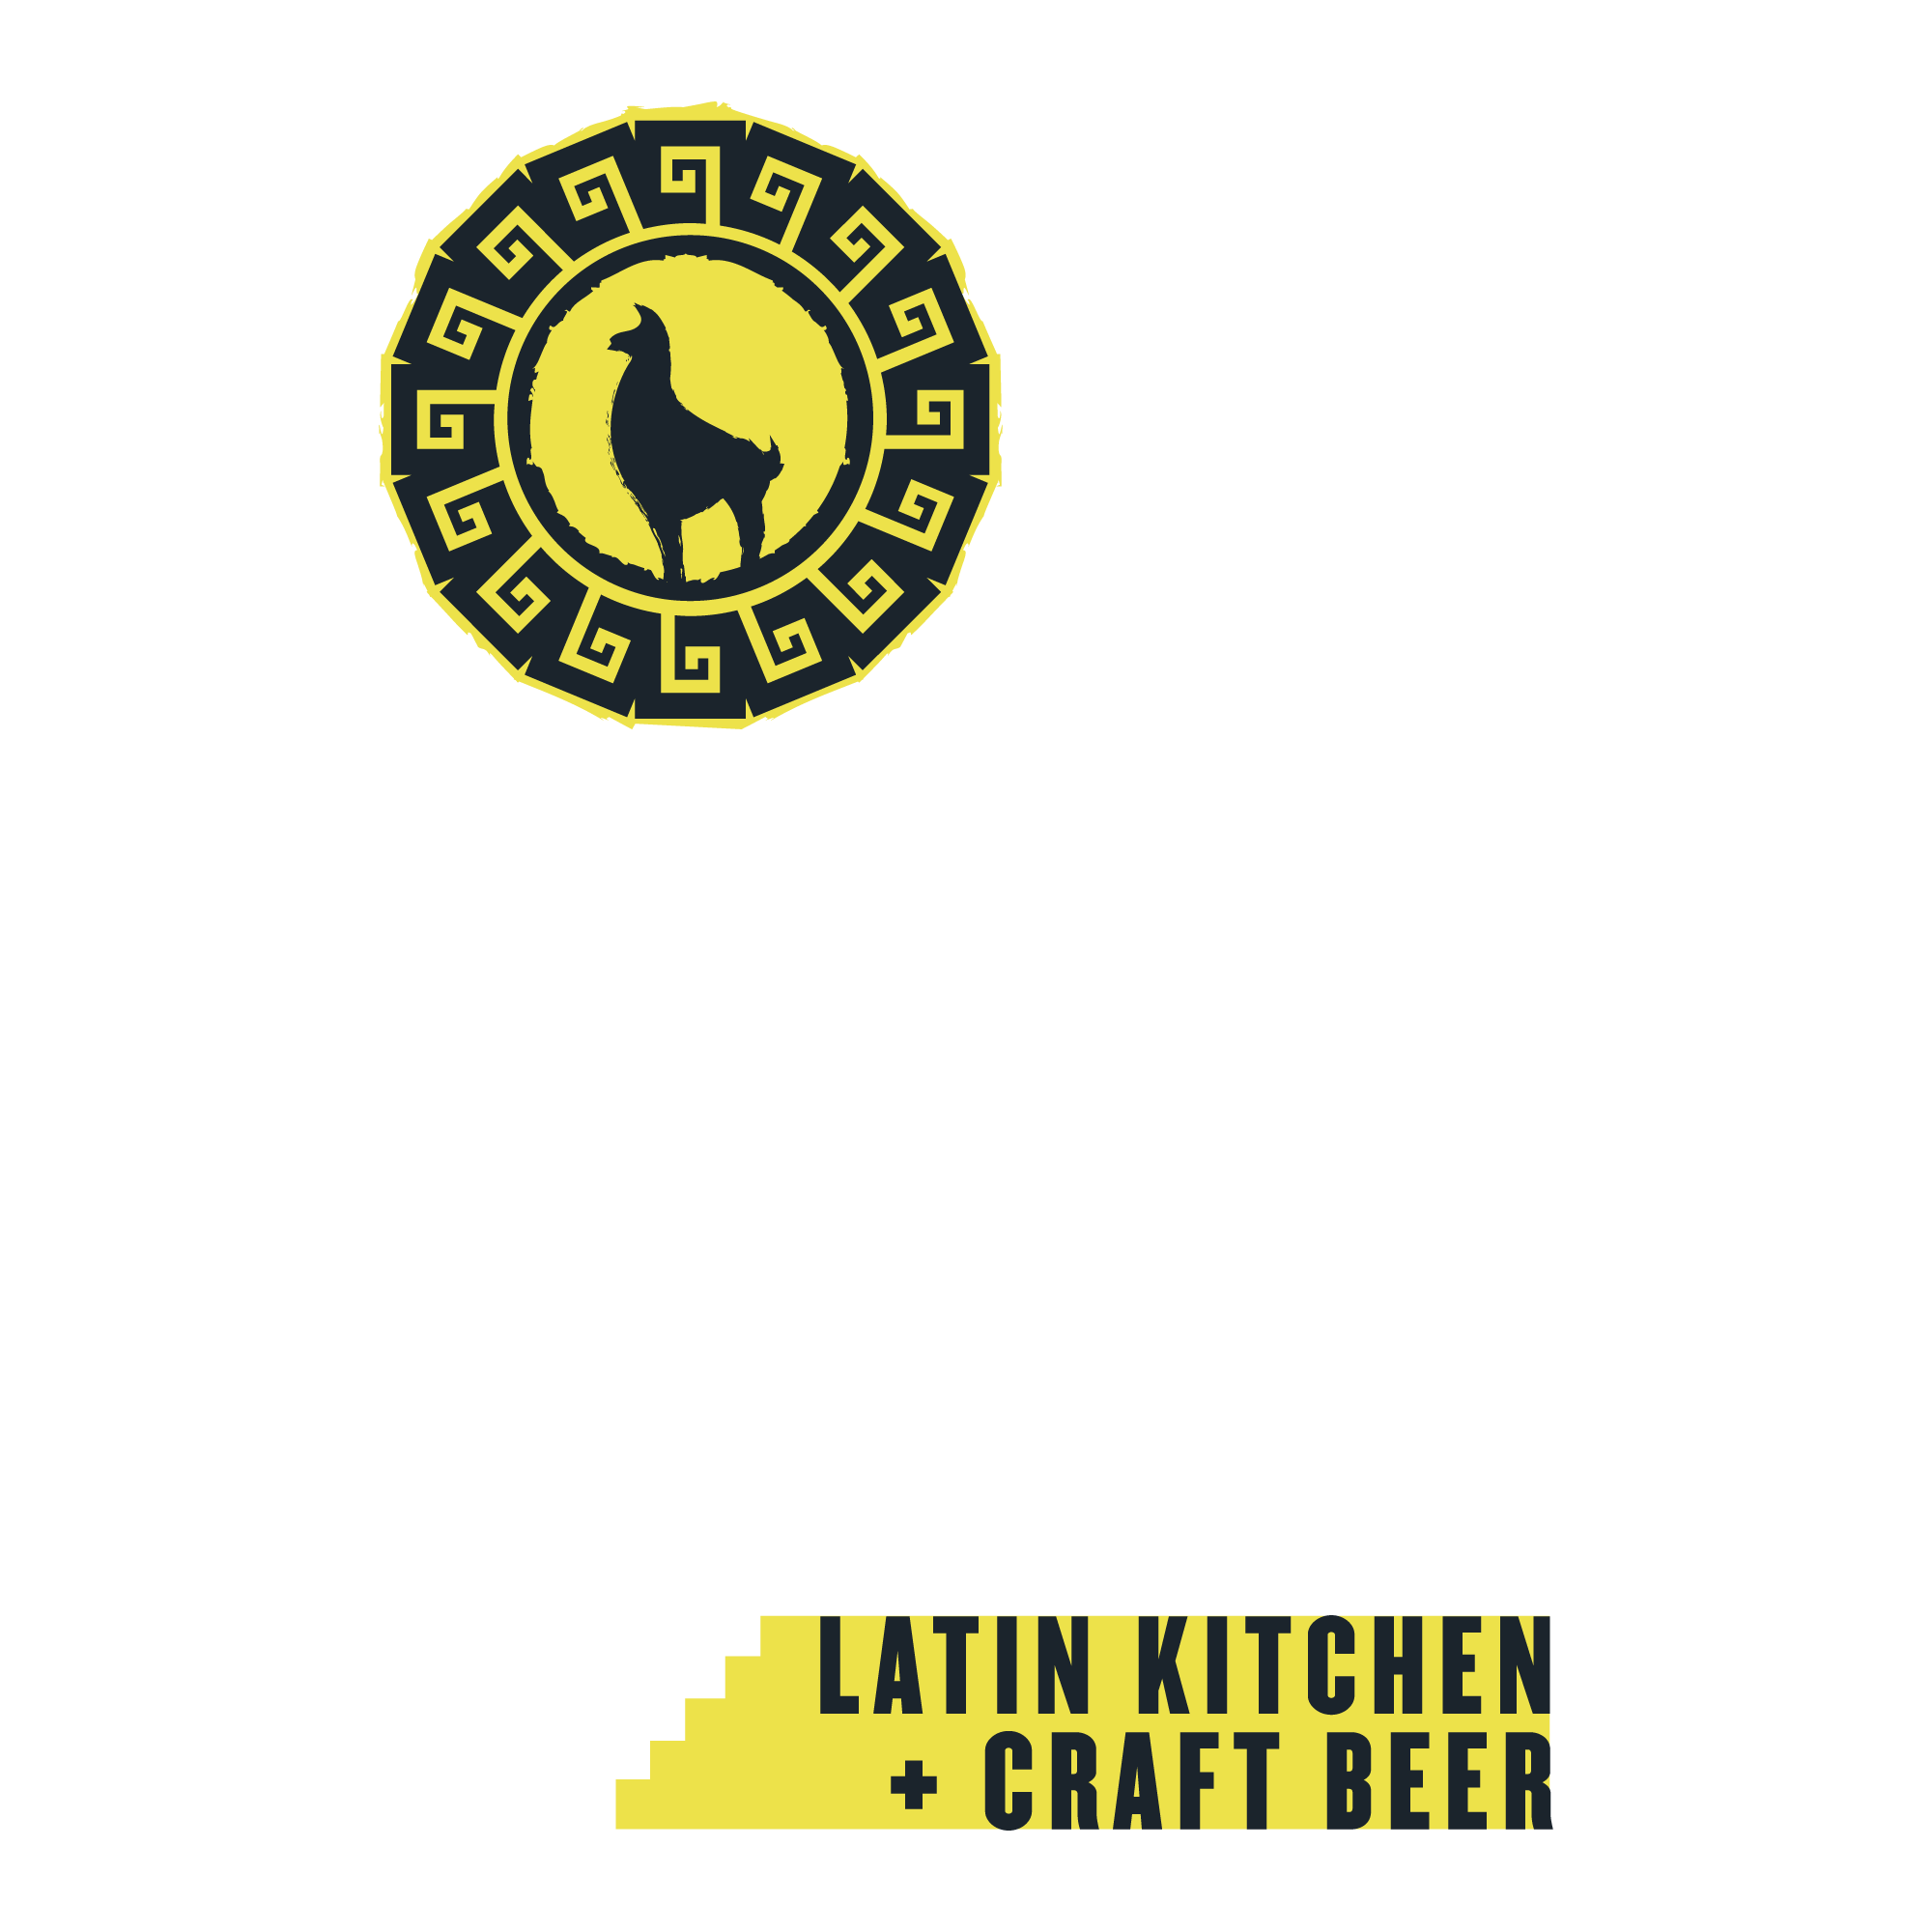 INCA LATIN KITCHEN AND CRAFT BEER LOGO